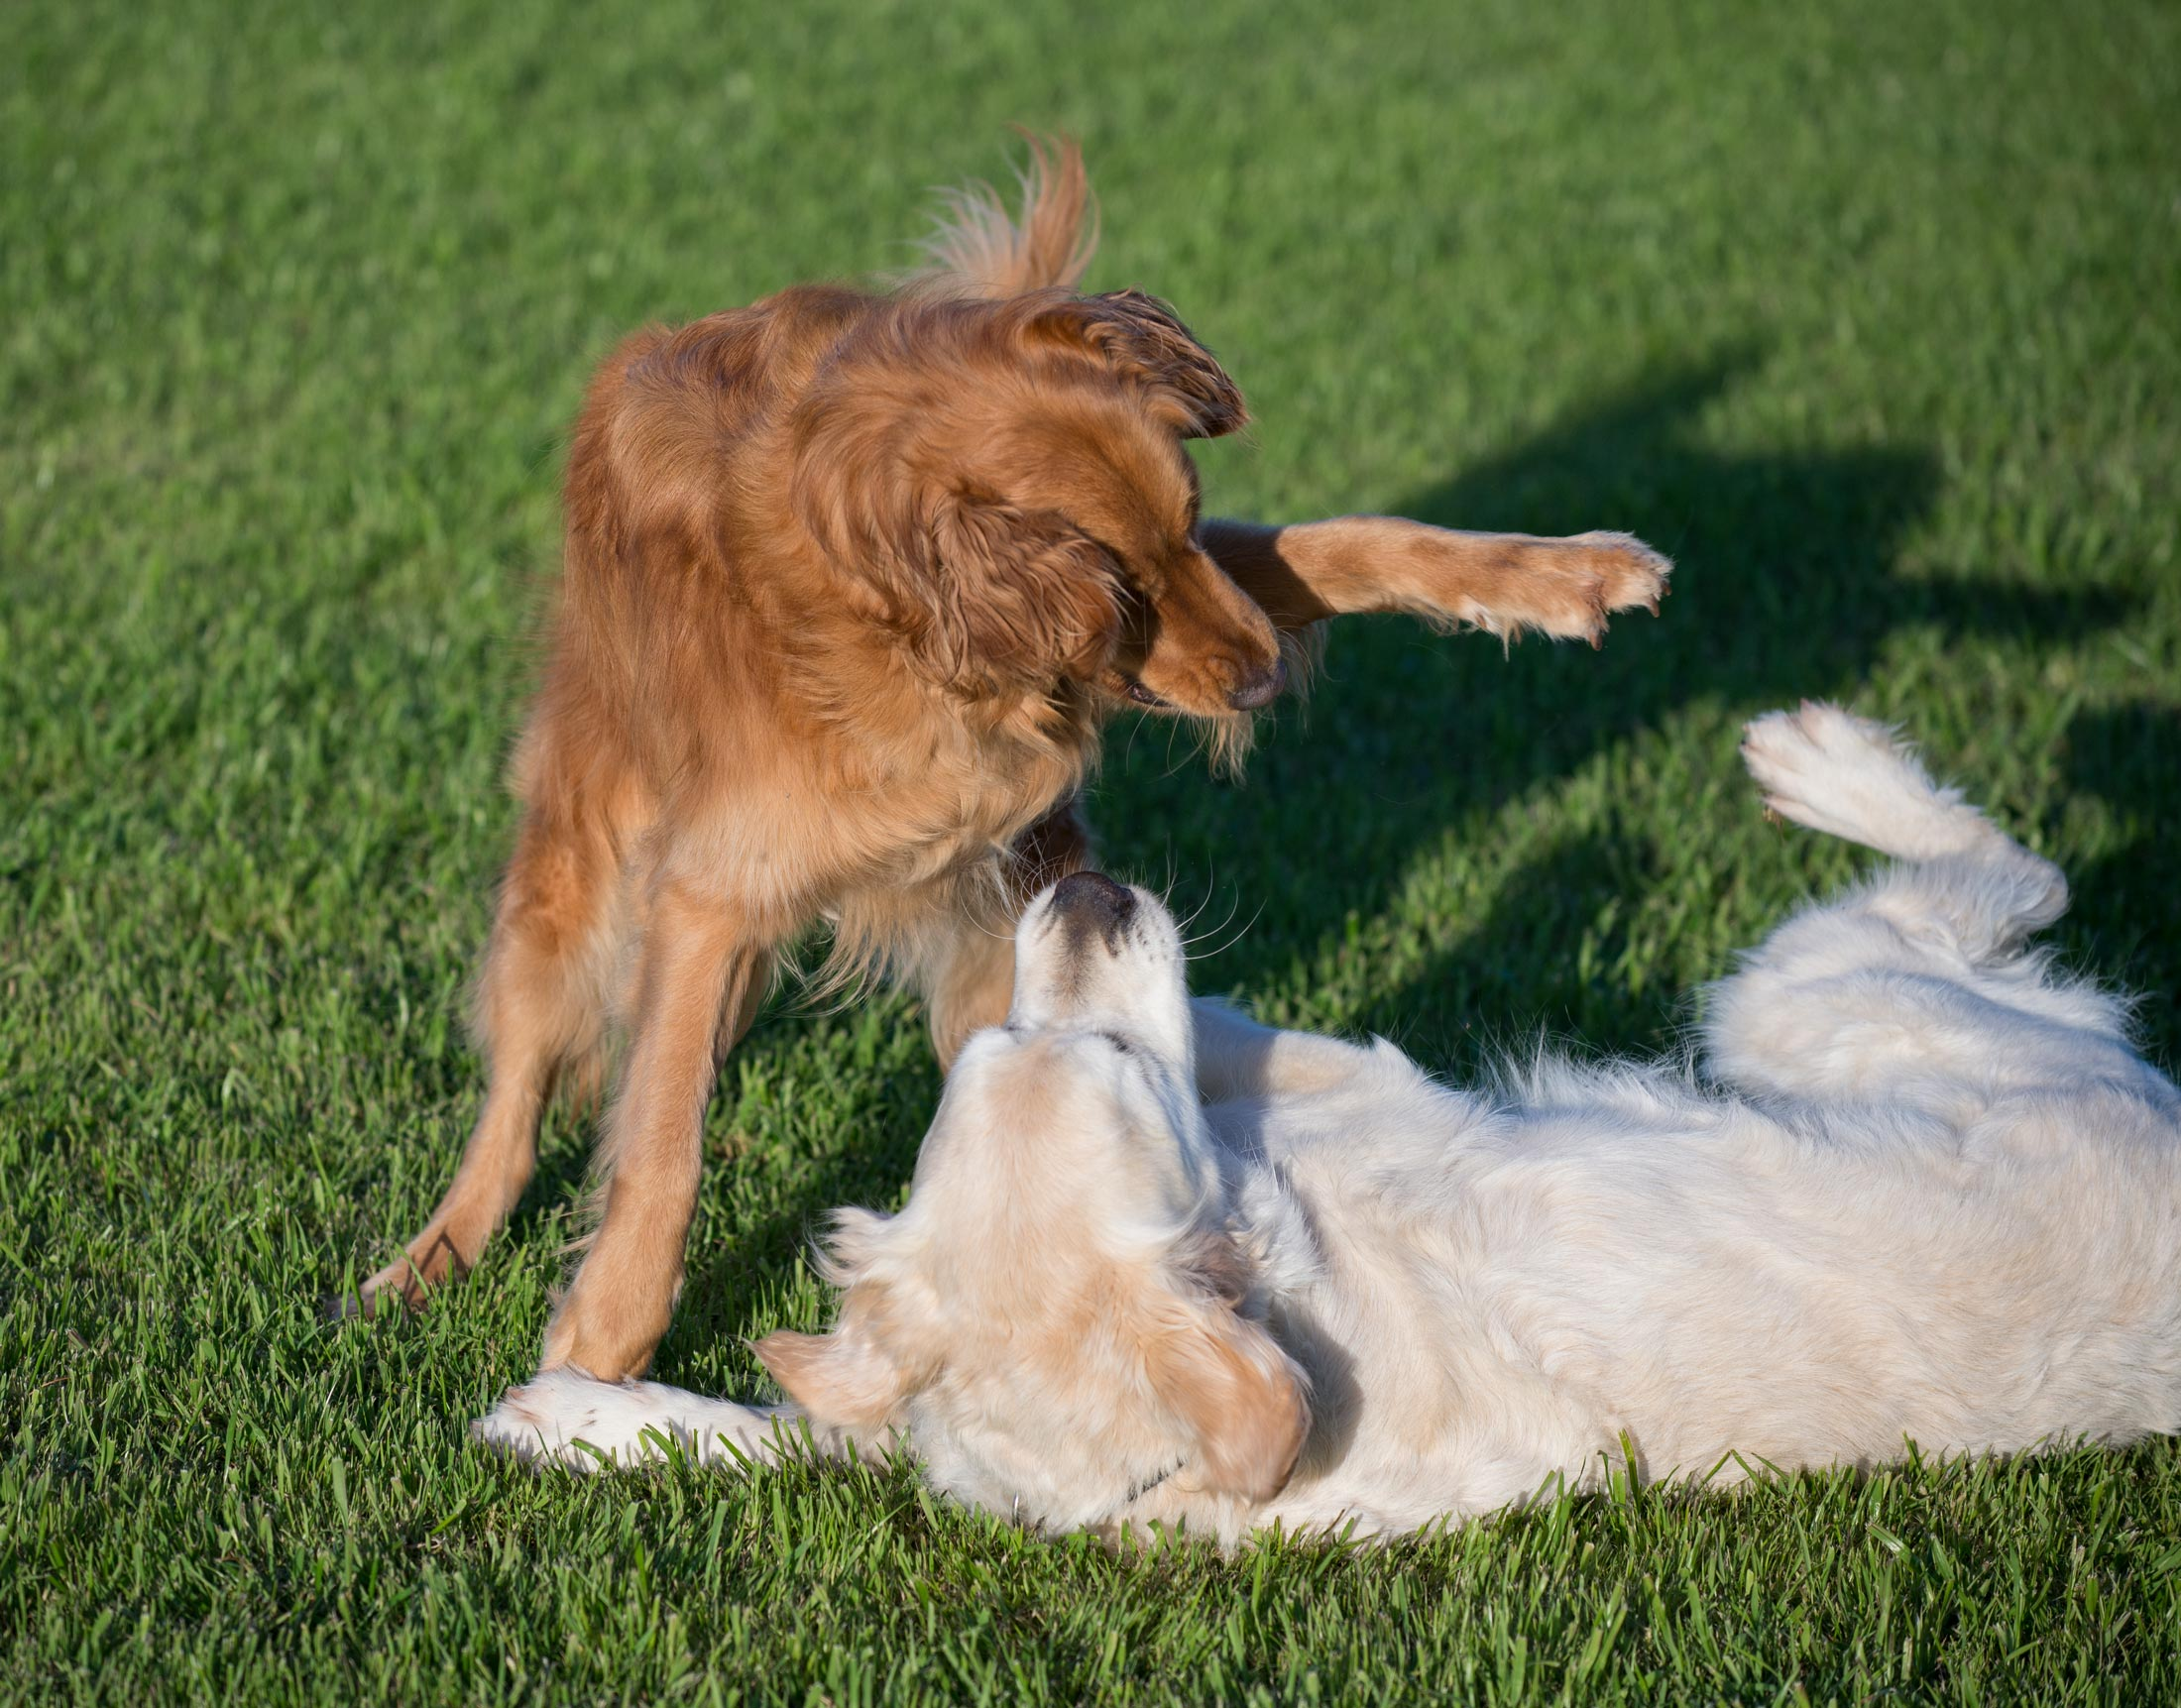 Image Result For Drugged Dog Can